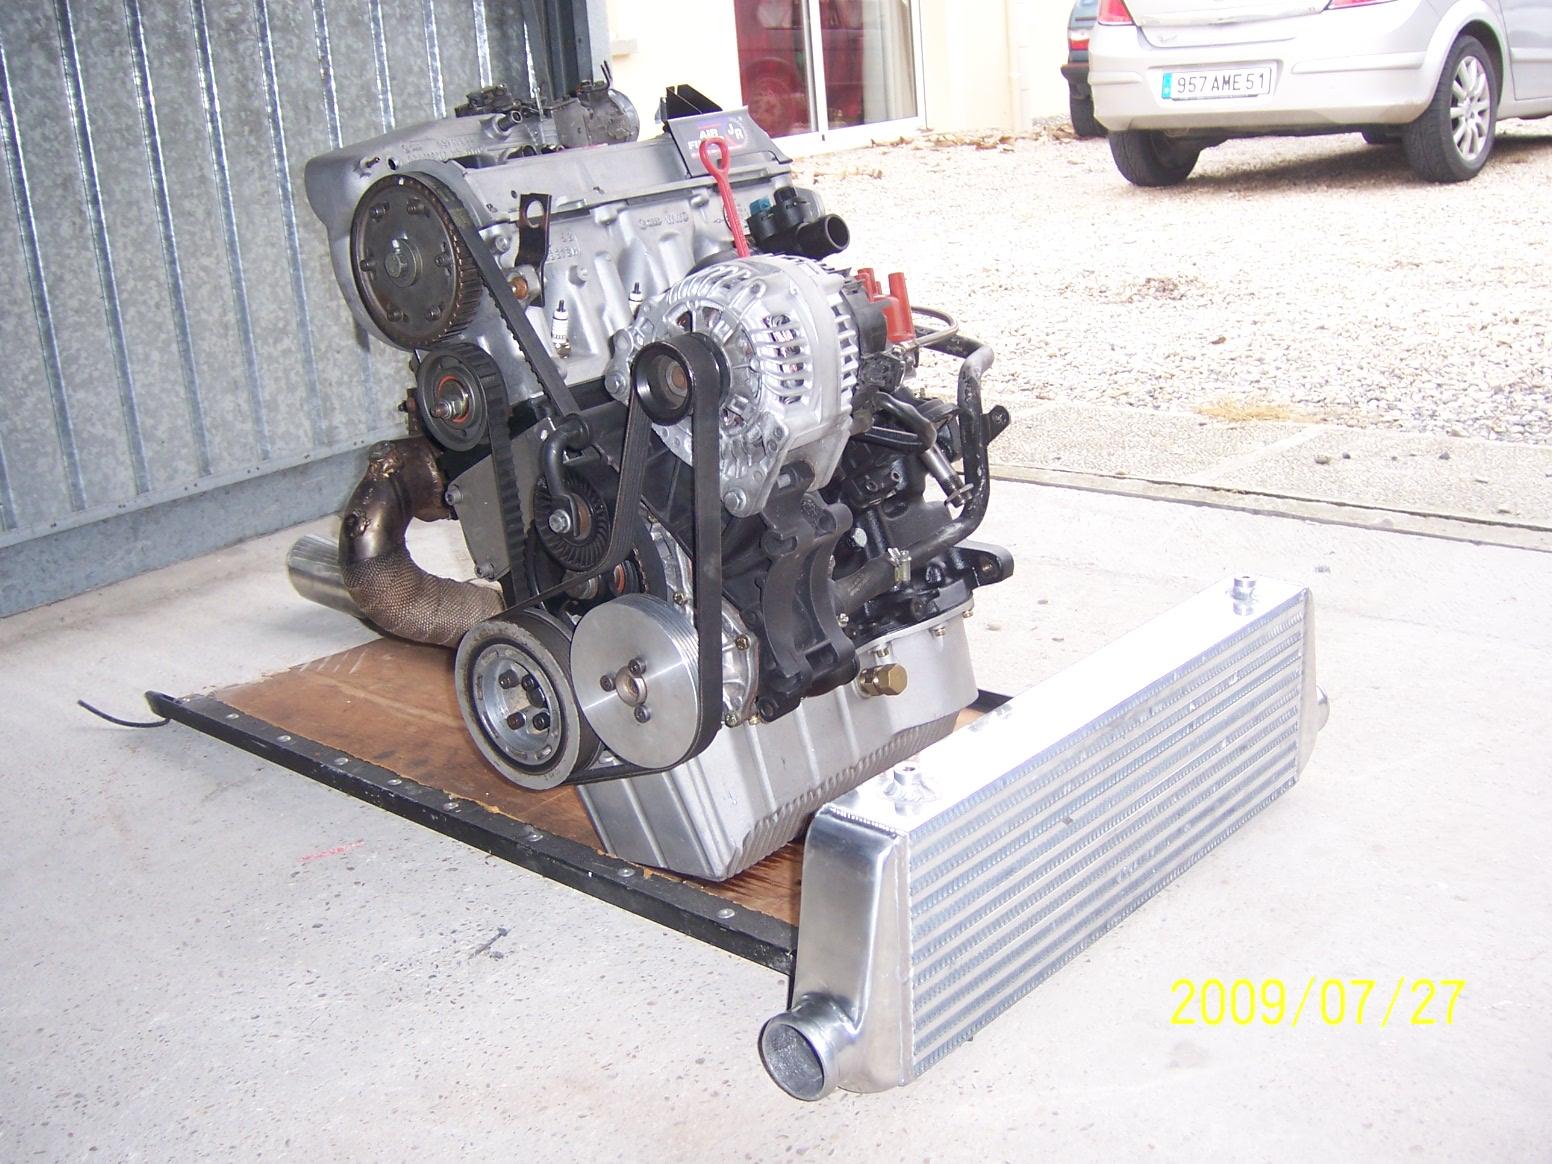 caddy g60 turbo 944740239729g60_turbal_020